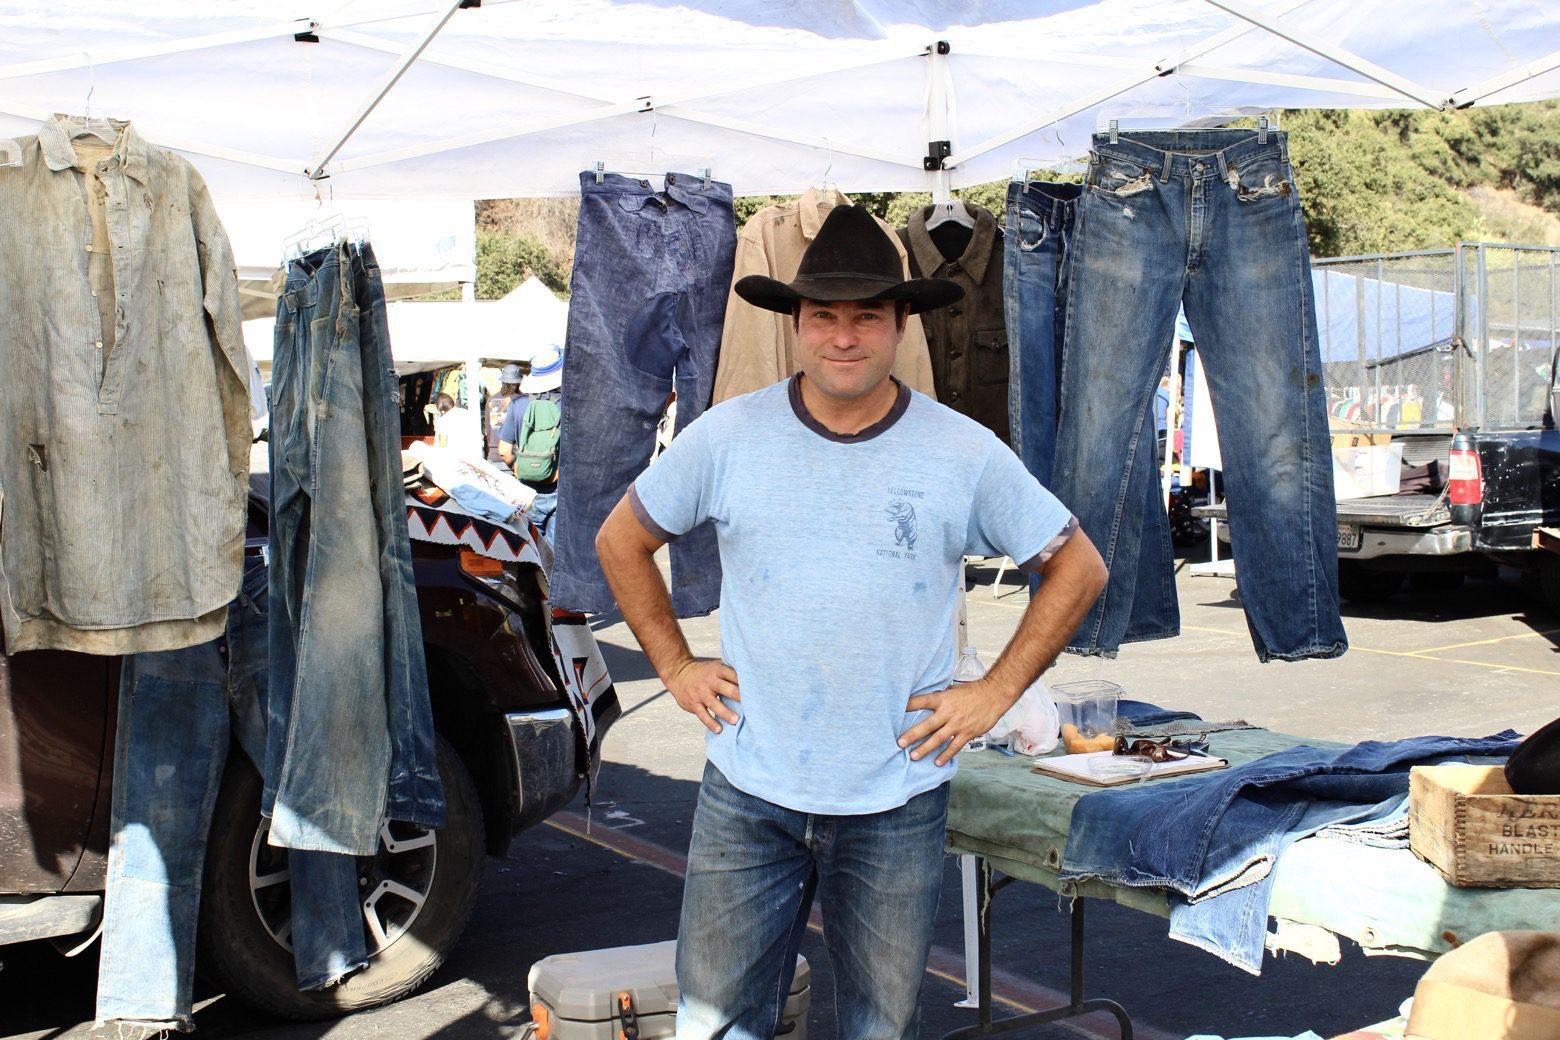 Brit Eaton at the Rose Bowl flea market